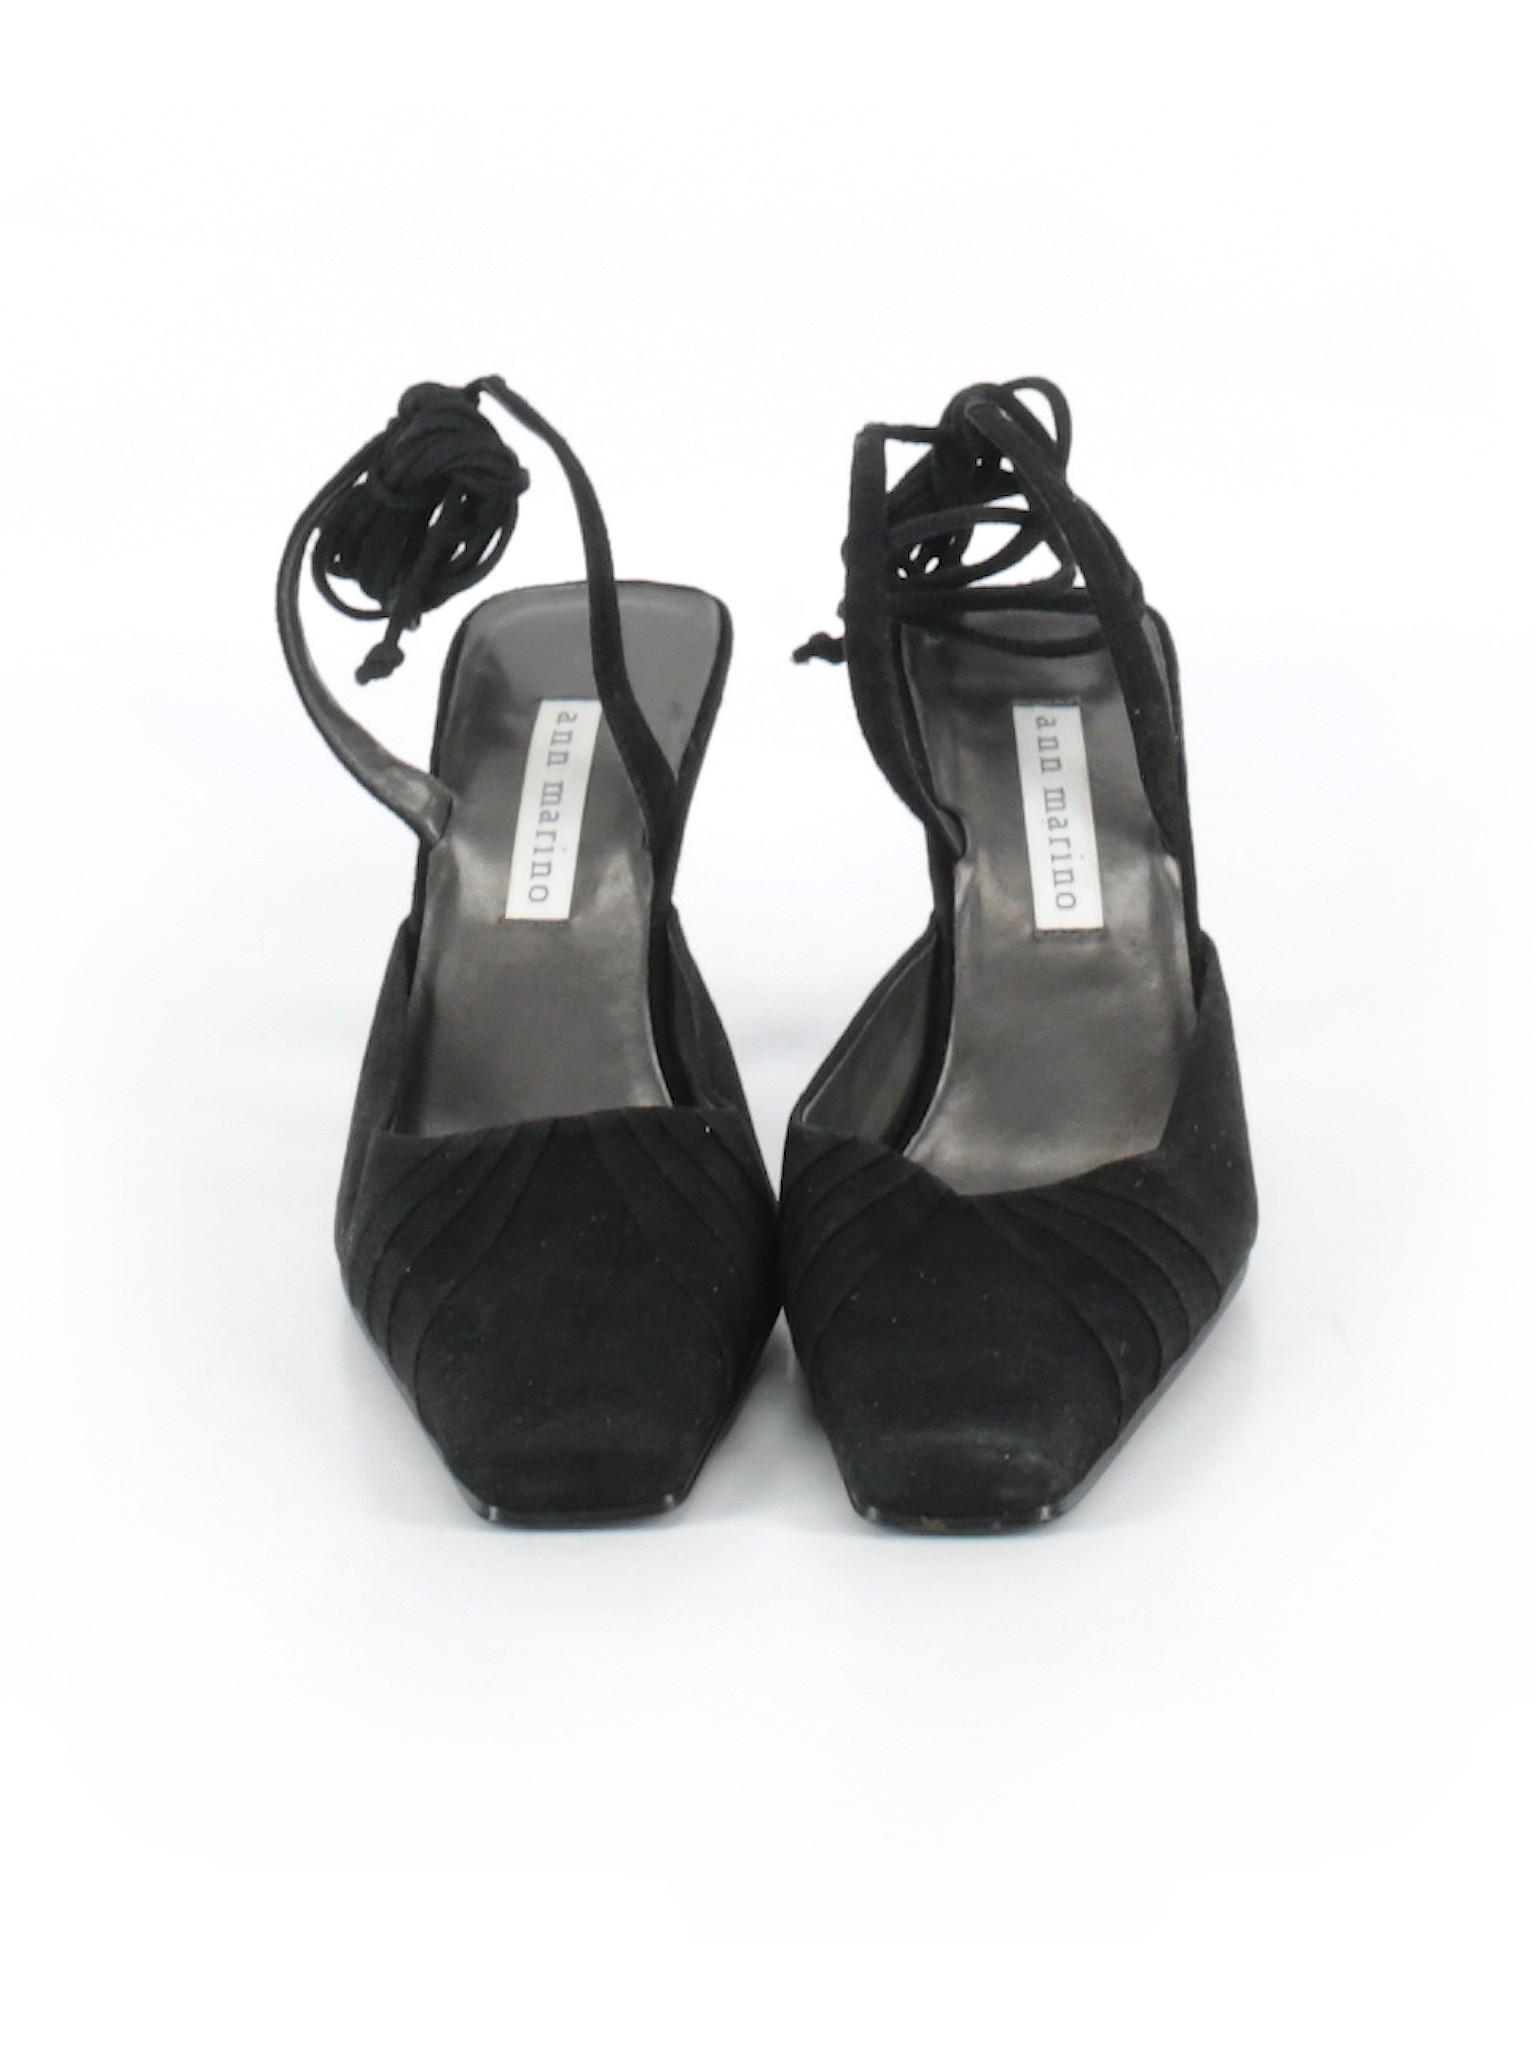 Heels Marino Ann Marino promotion Marino Boutique Heels promotion Ann Boutique Boutique Ann promotion Heels qOf7q